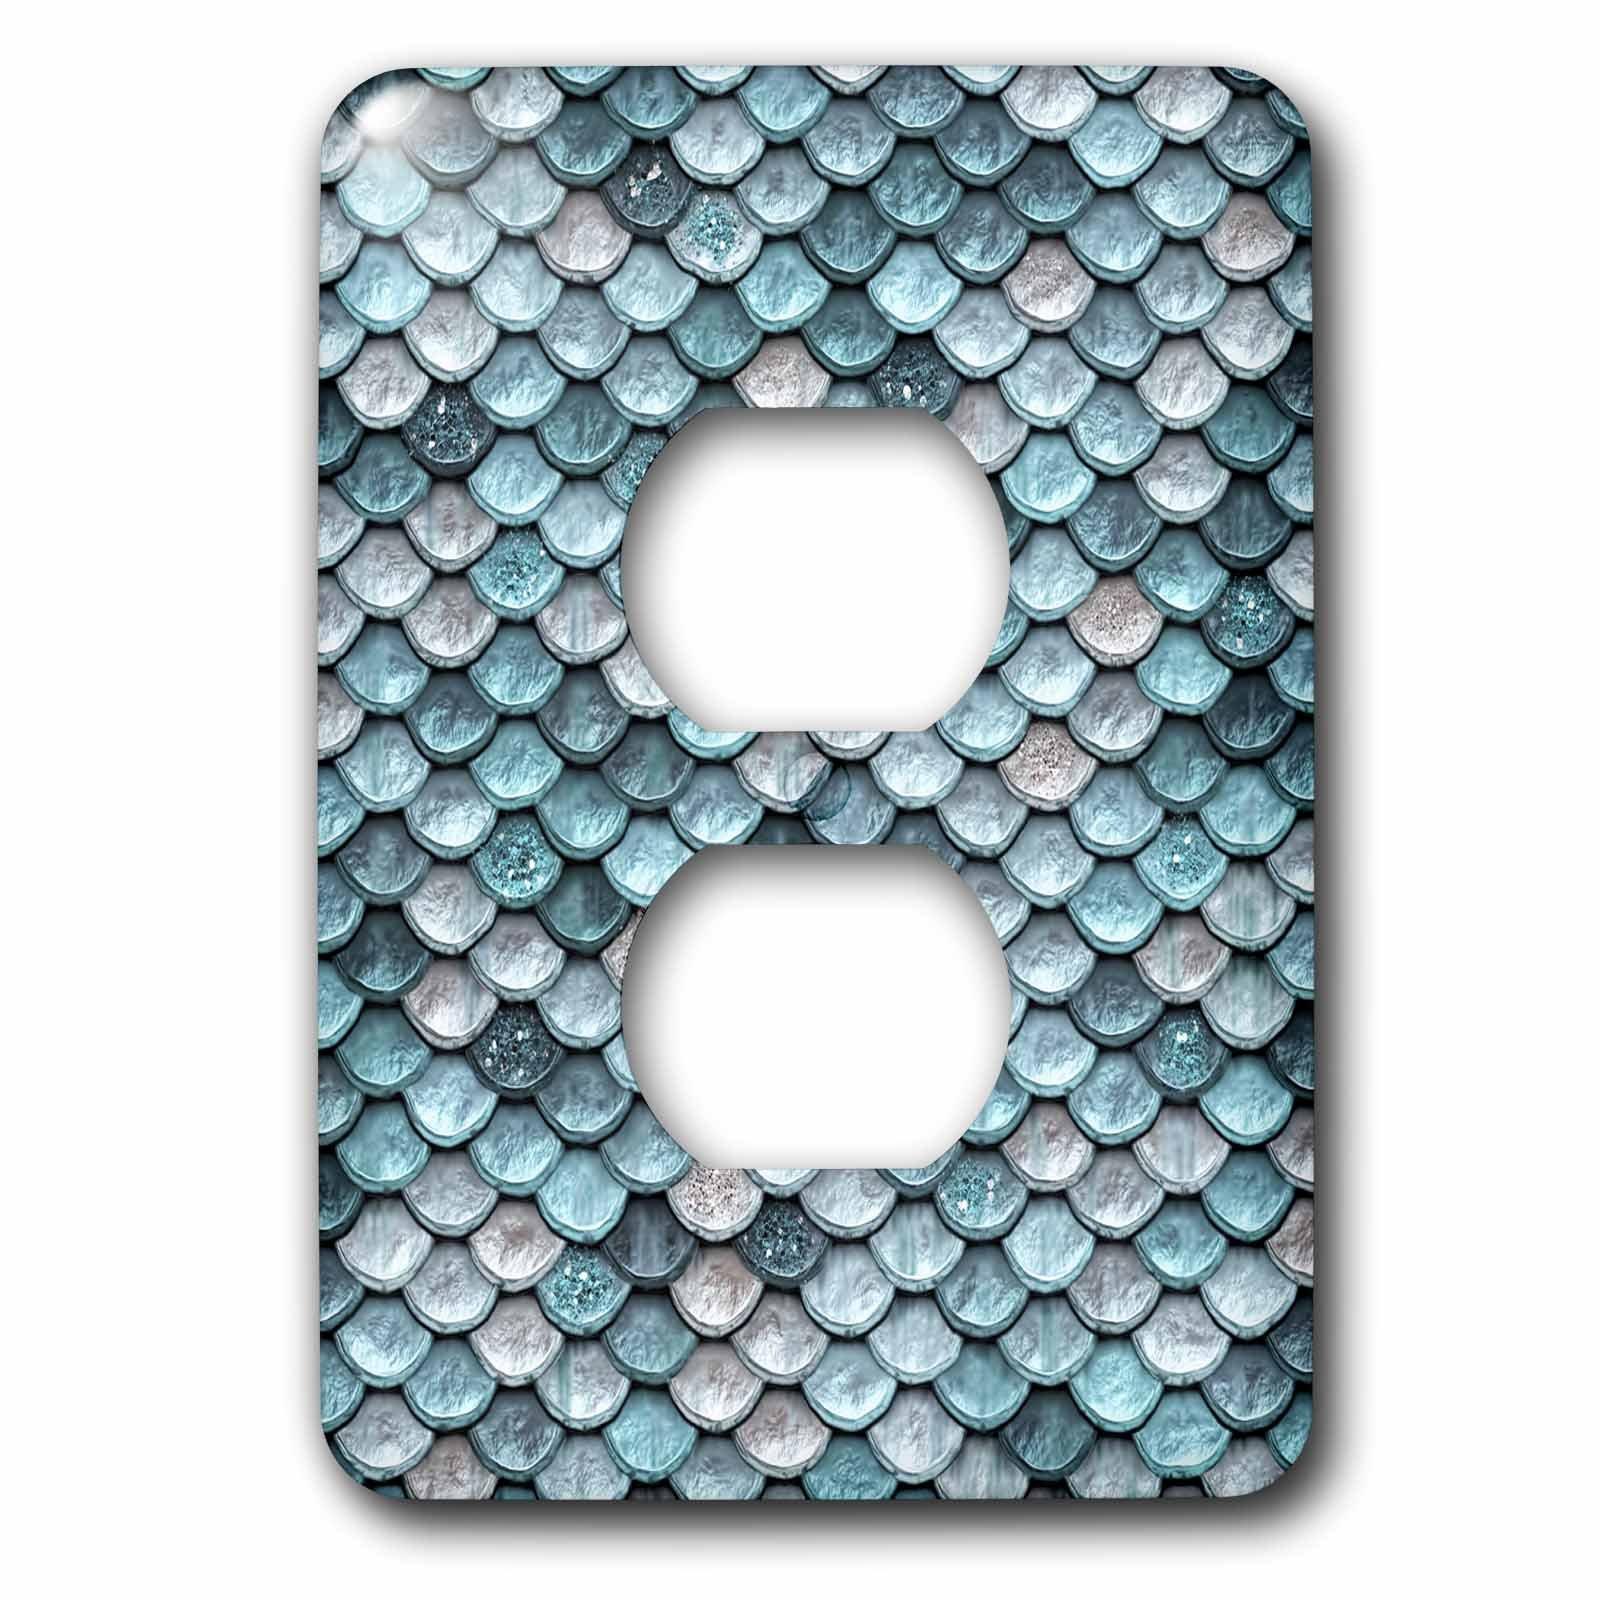 3dRose Uta Naumann Faux Glitter Pattern - Sparkling Teal Luxury Elegant Mermaid Scales Glitter Effect Artprint - Light Switch Covers - 2 plug outlet cover (lsp_267058_6)